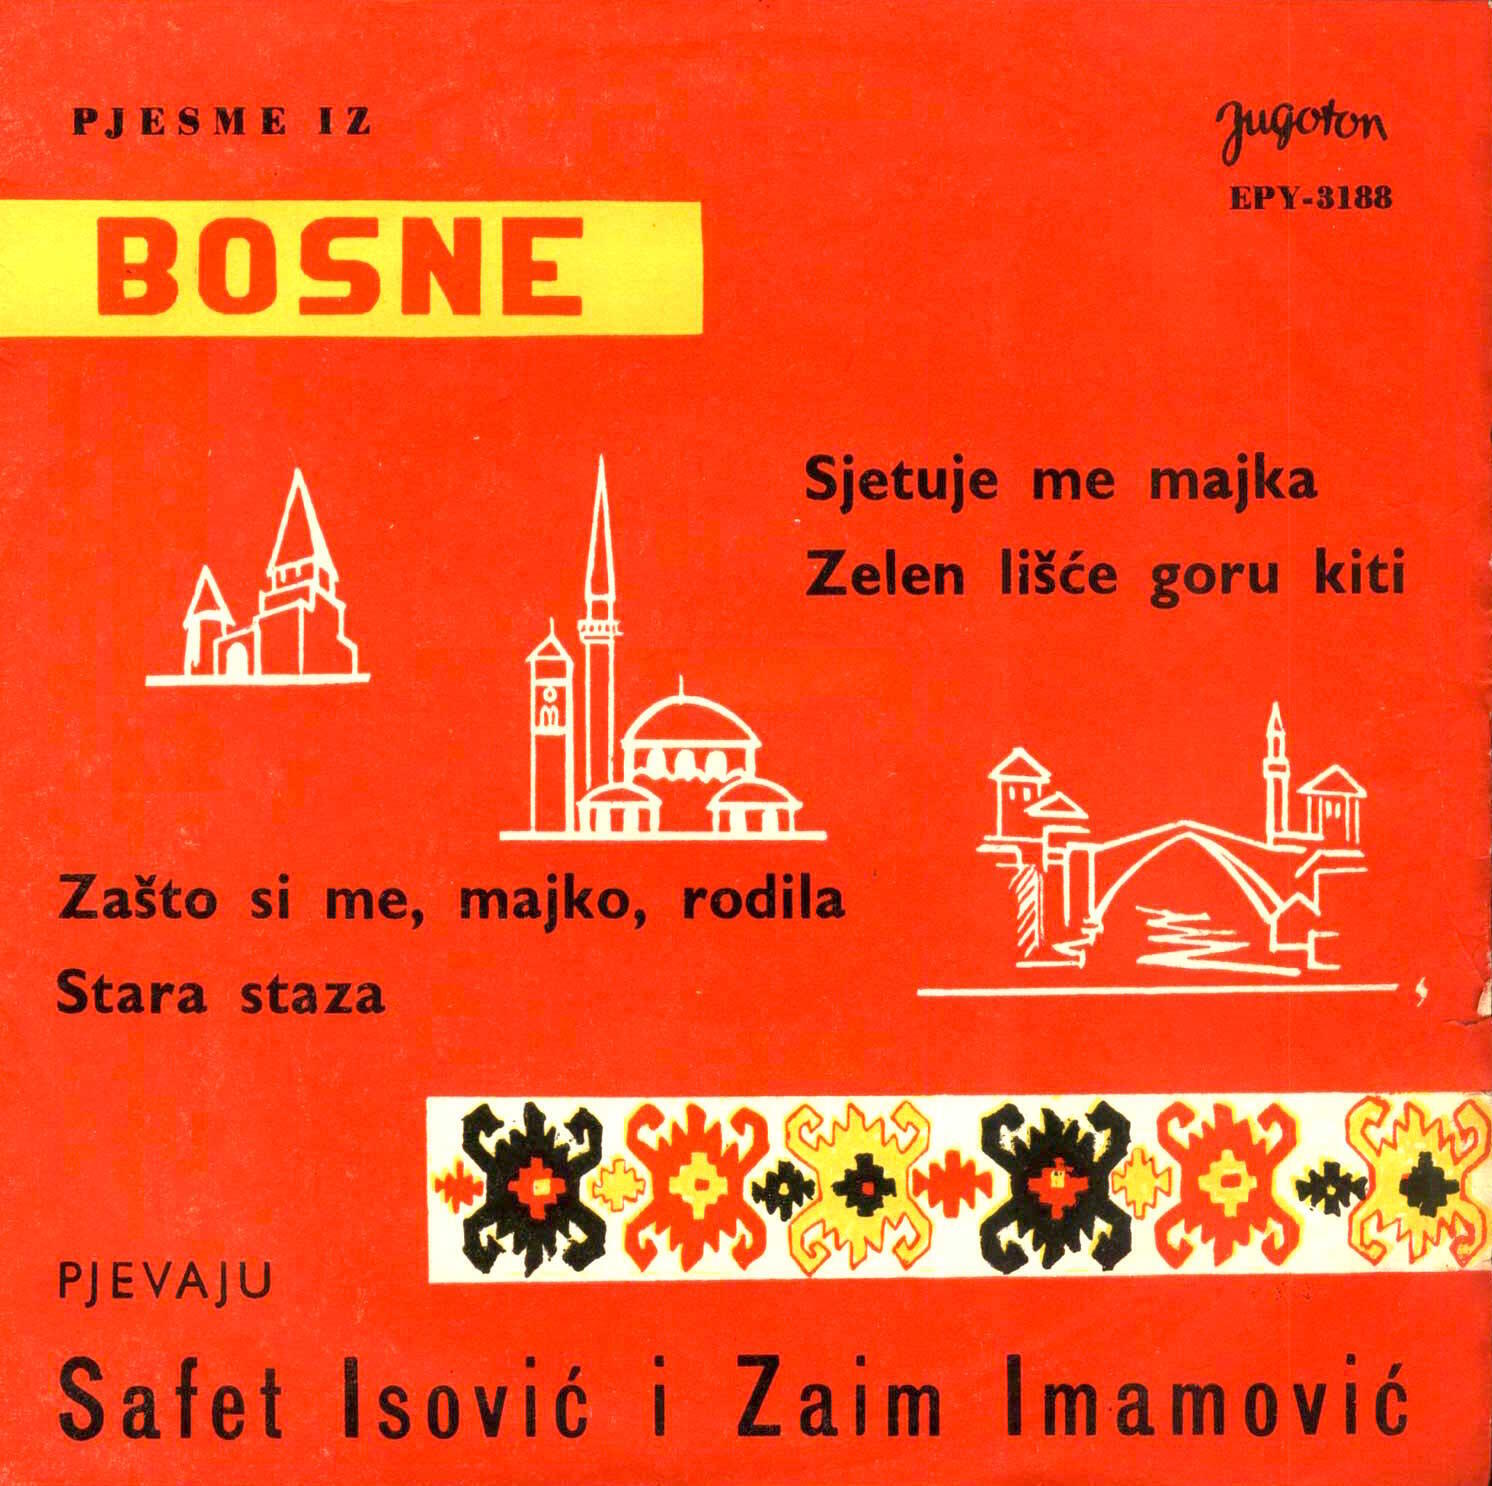 Isovic & Imamovic - Pjesme Bosne